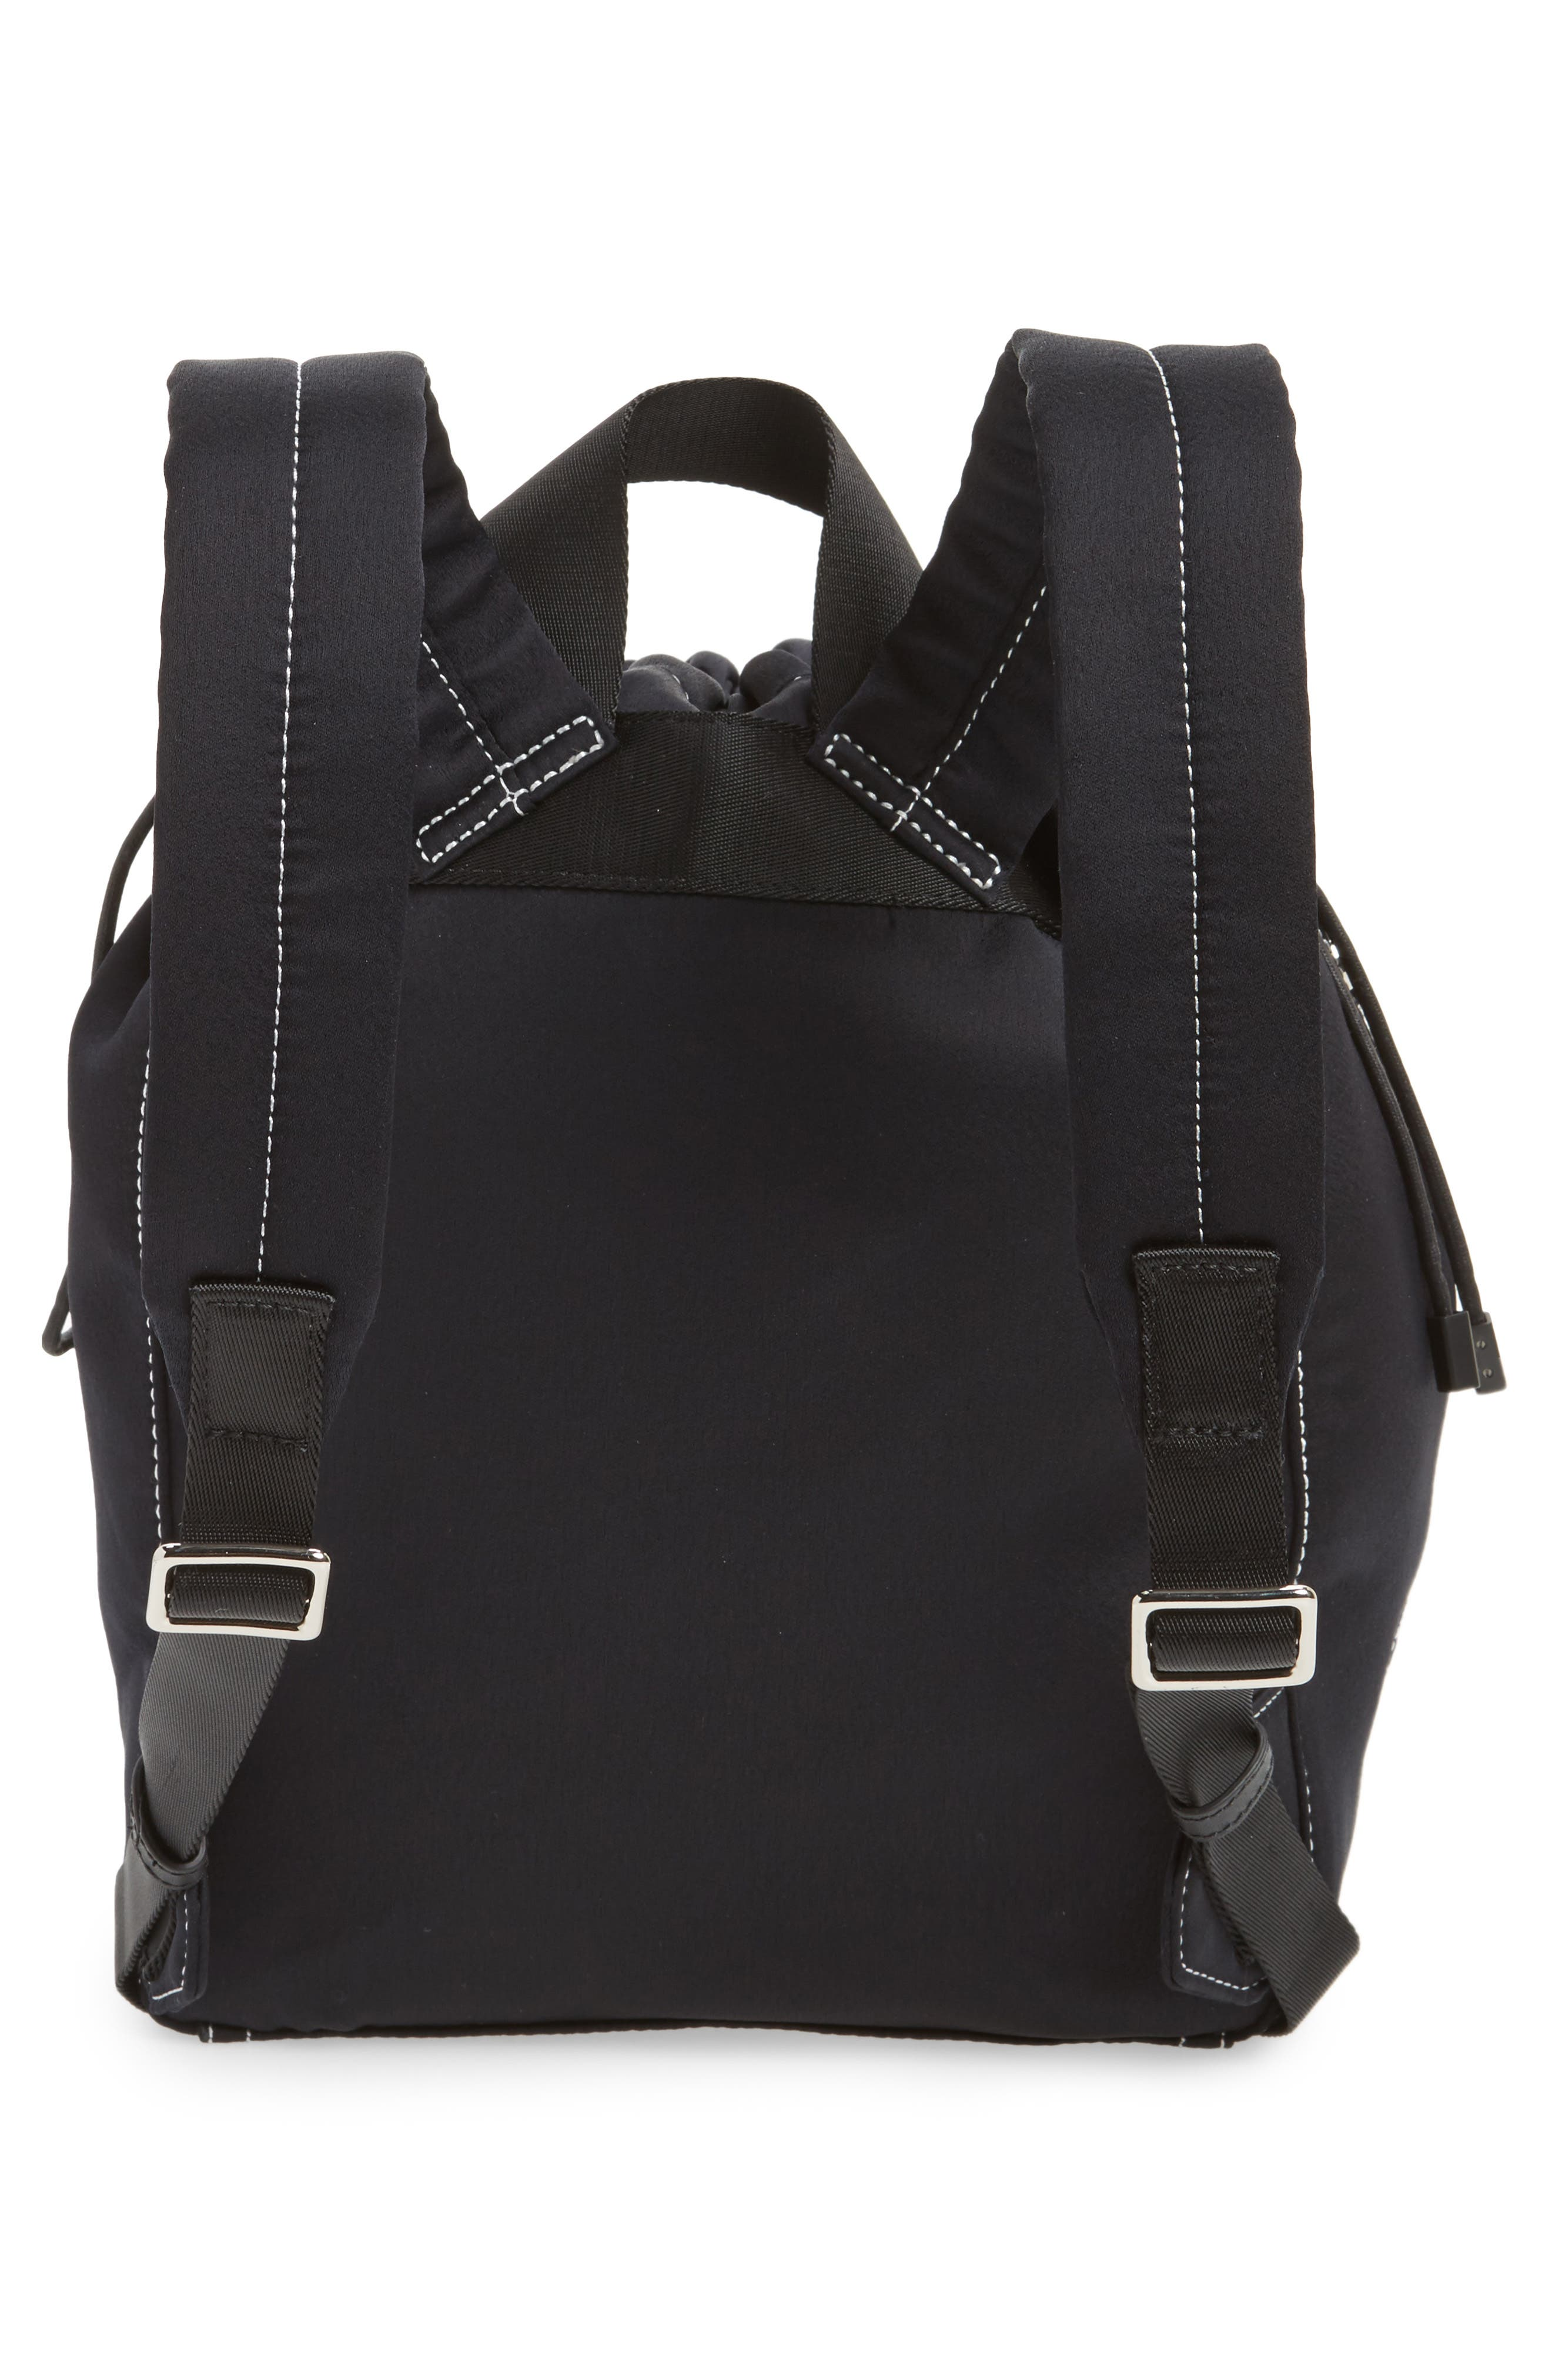 Phillip Lim 3.1 Medium Go-Go Lace-Up Backpack,                             Alternate thumbnail 3, color,                             420